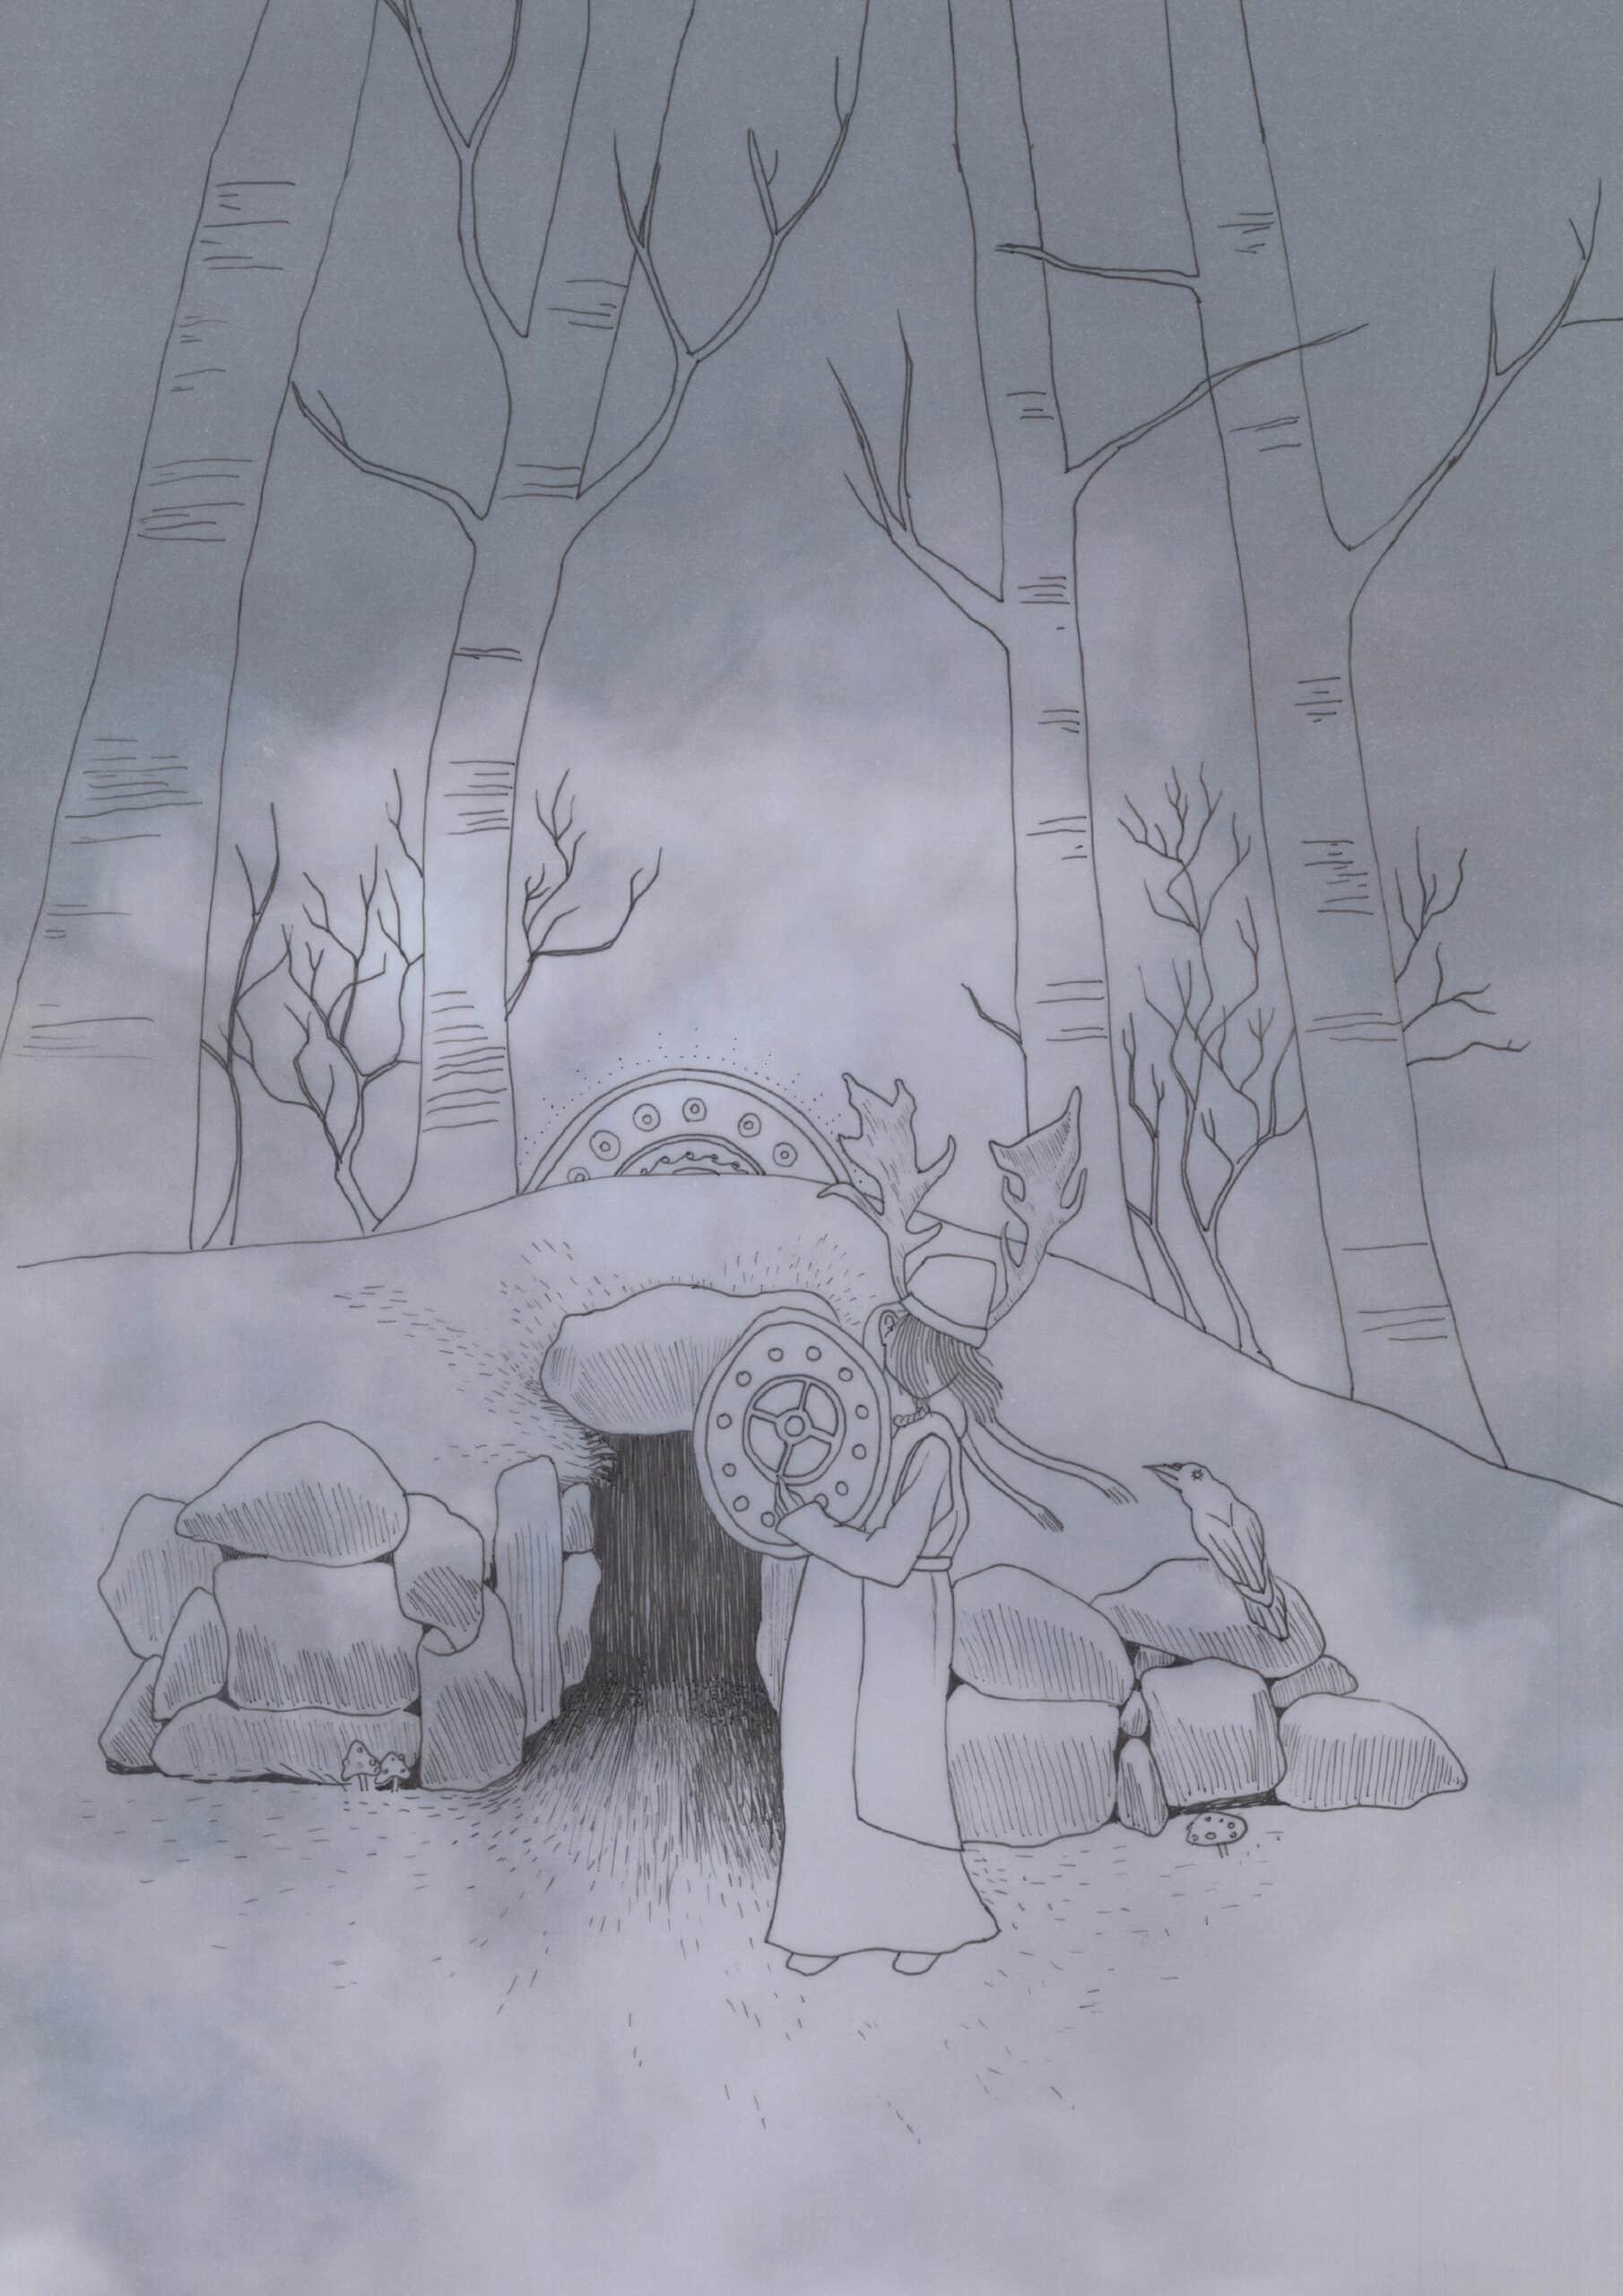 Yule Midwinter Illustration Solawende 2018